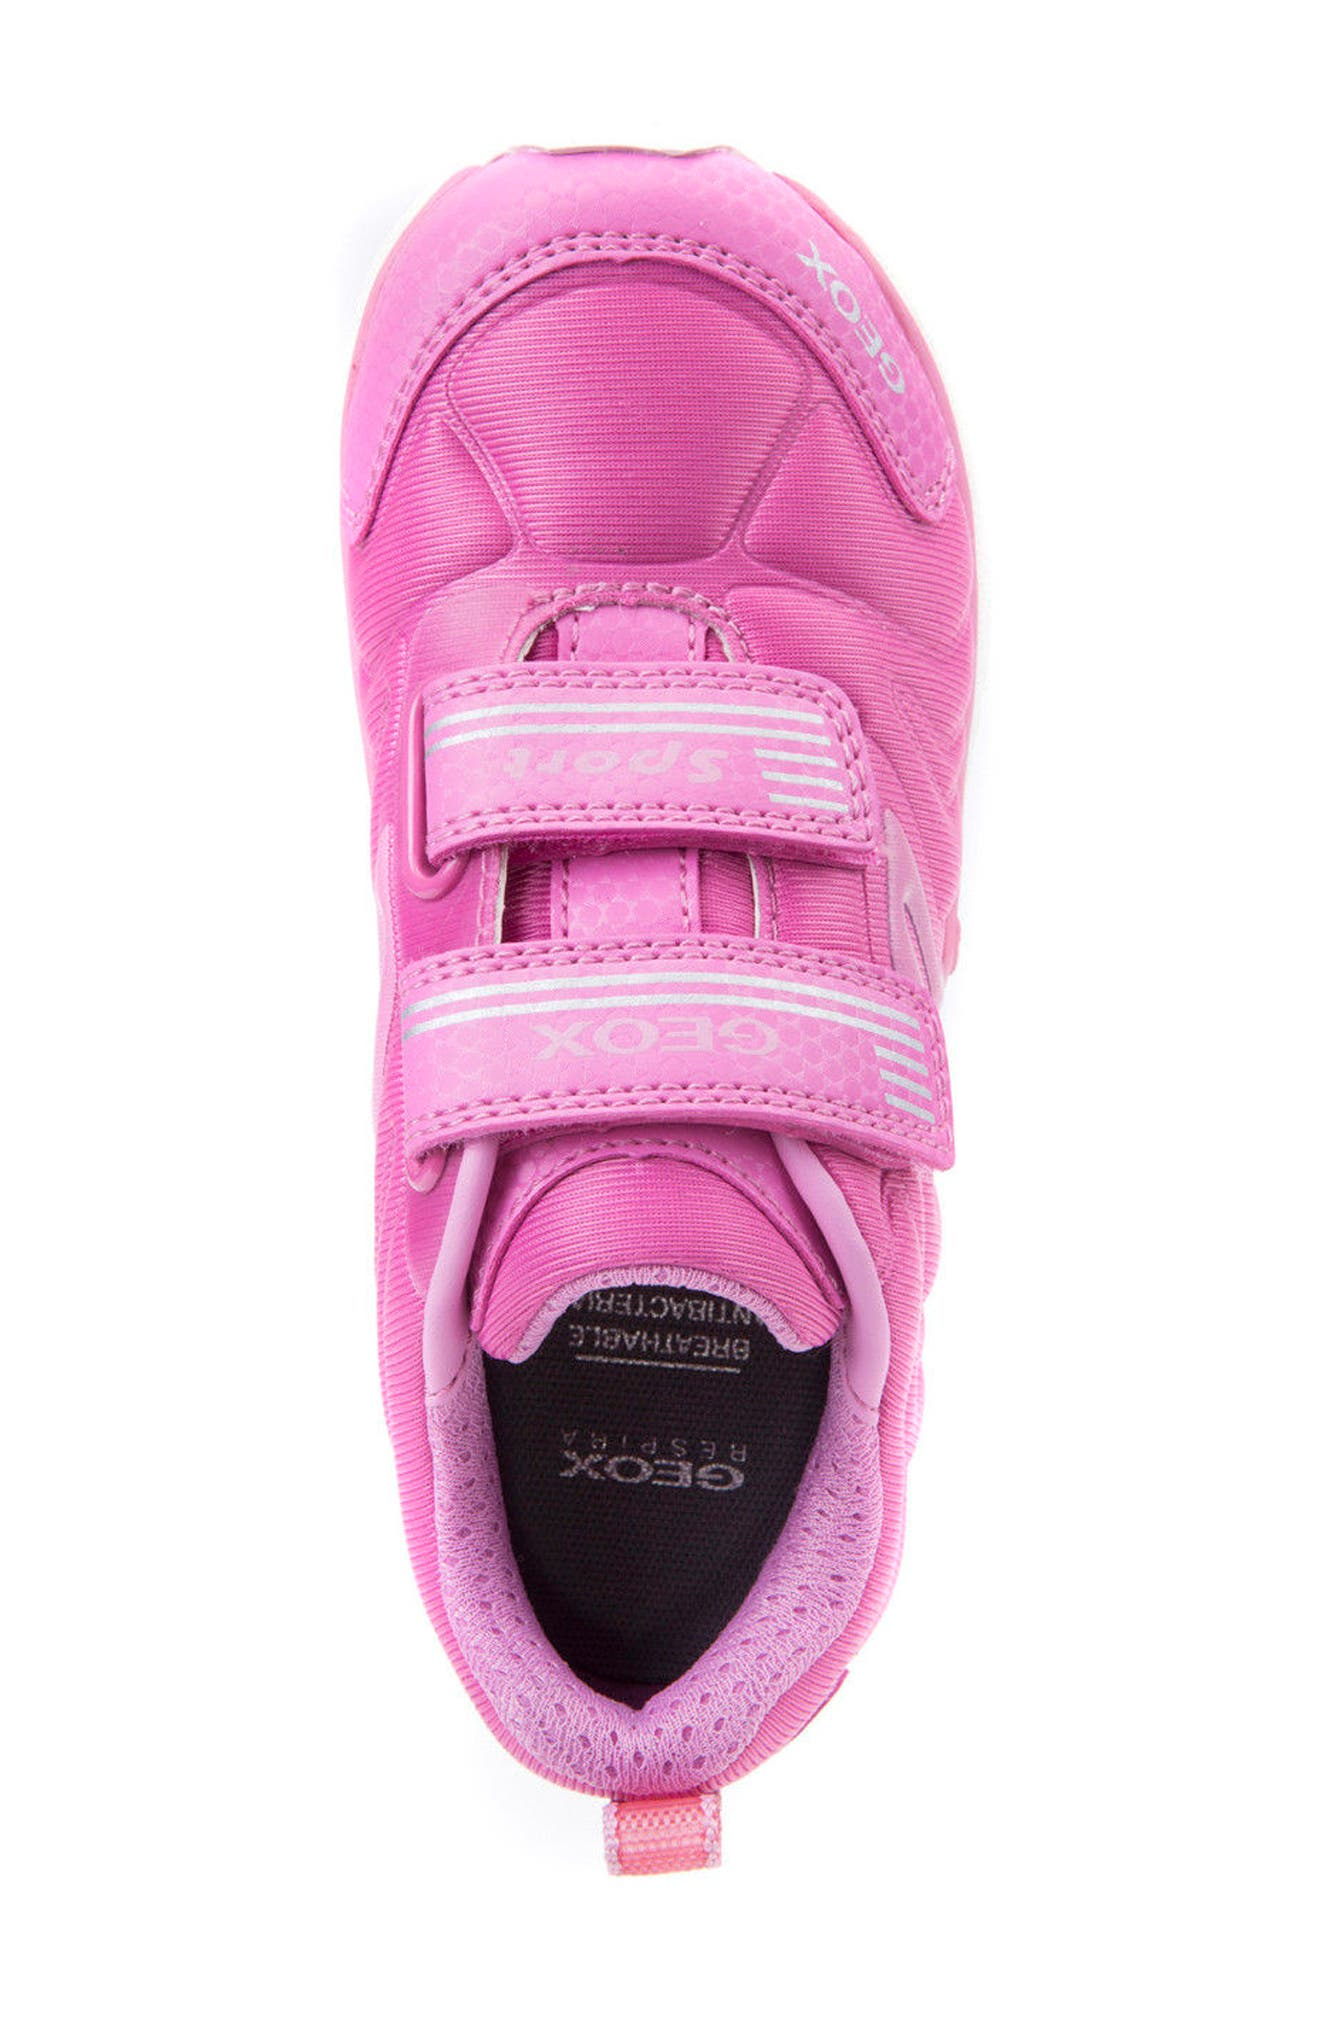 Torque Sneaker,                             Alternate thumbnail 5, color,                             Fuchsia/ Dark Pink